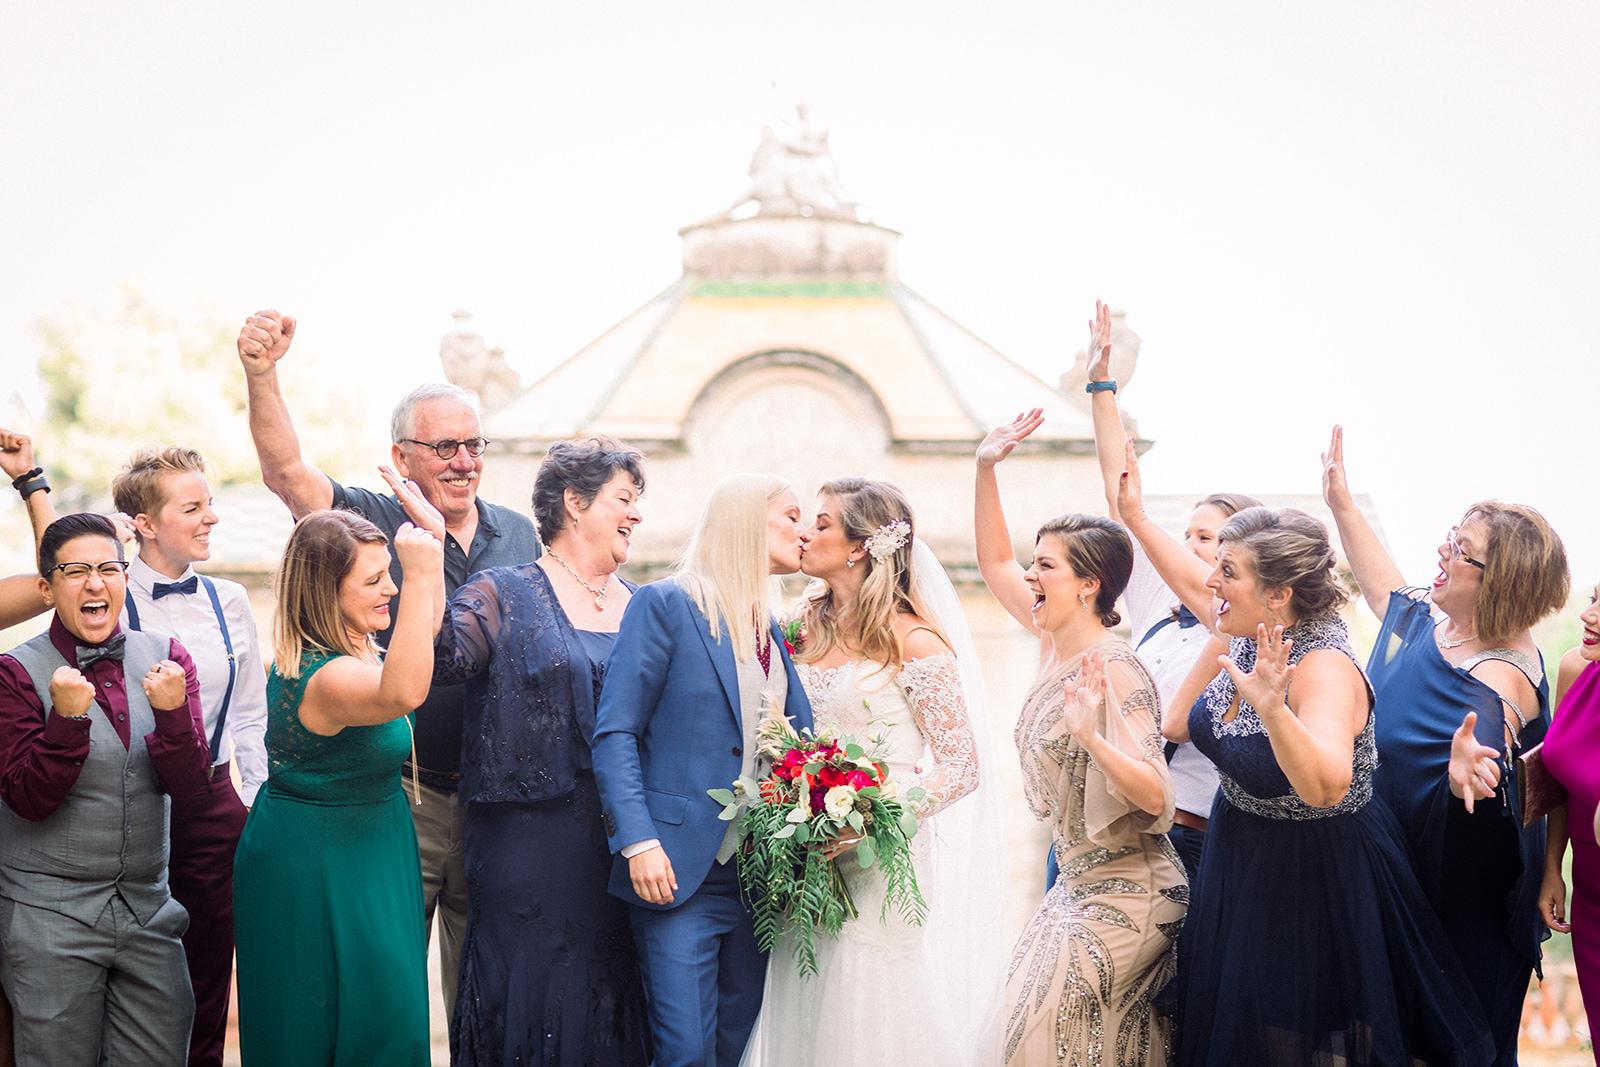 Four Corners Photography Liz and Jessica Wedding in Barcelona Finals-462best atlanta wedding photographer barcelona wedding atlanta wedding spain wedding photographer barcelona wedding photographer.jpg